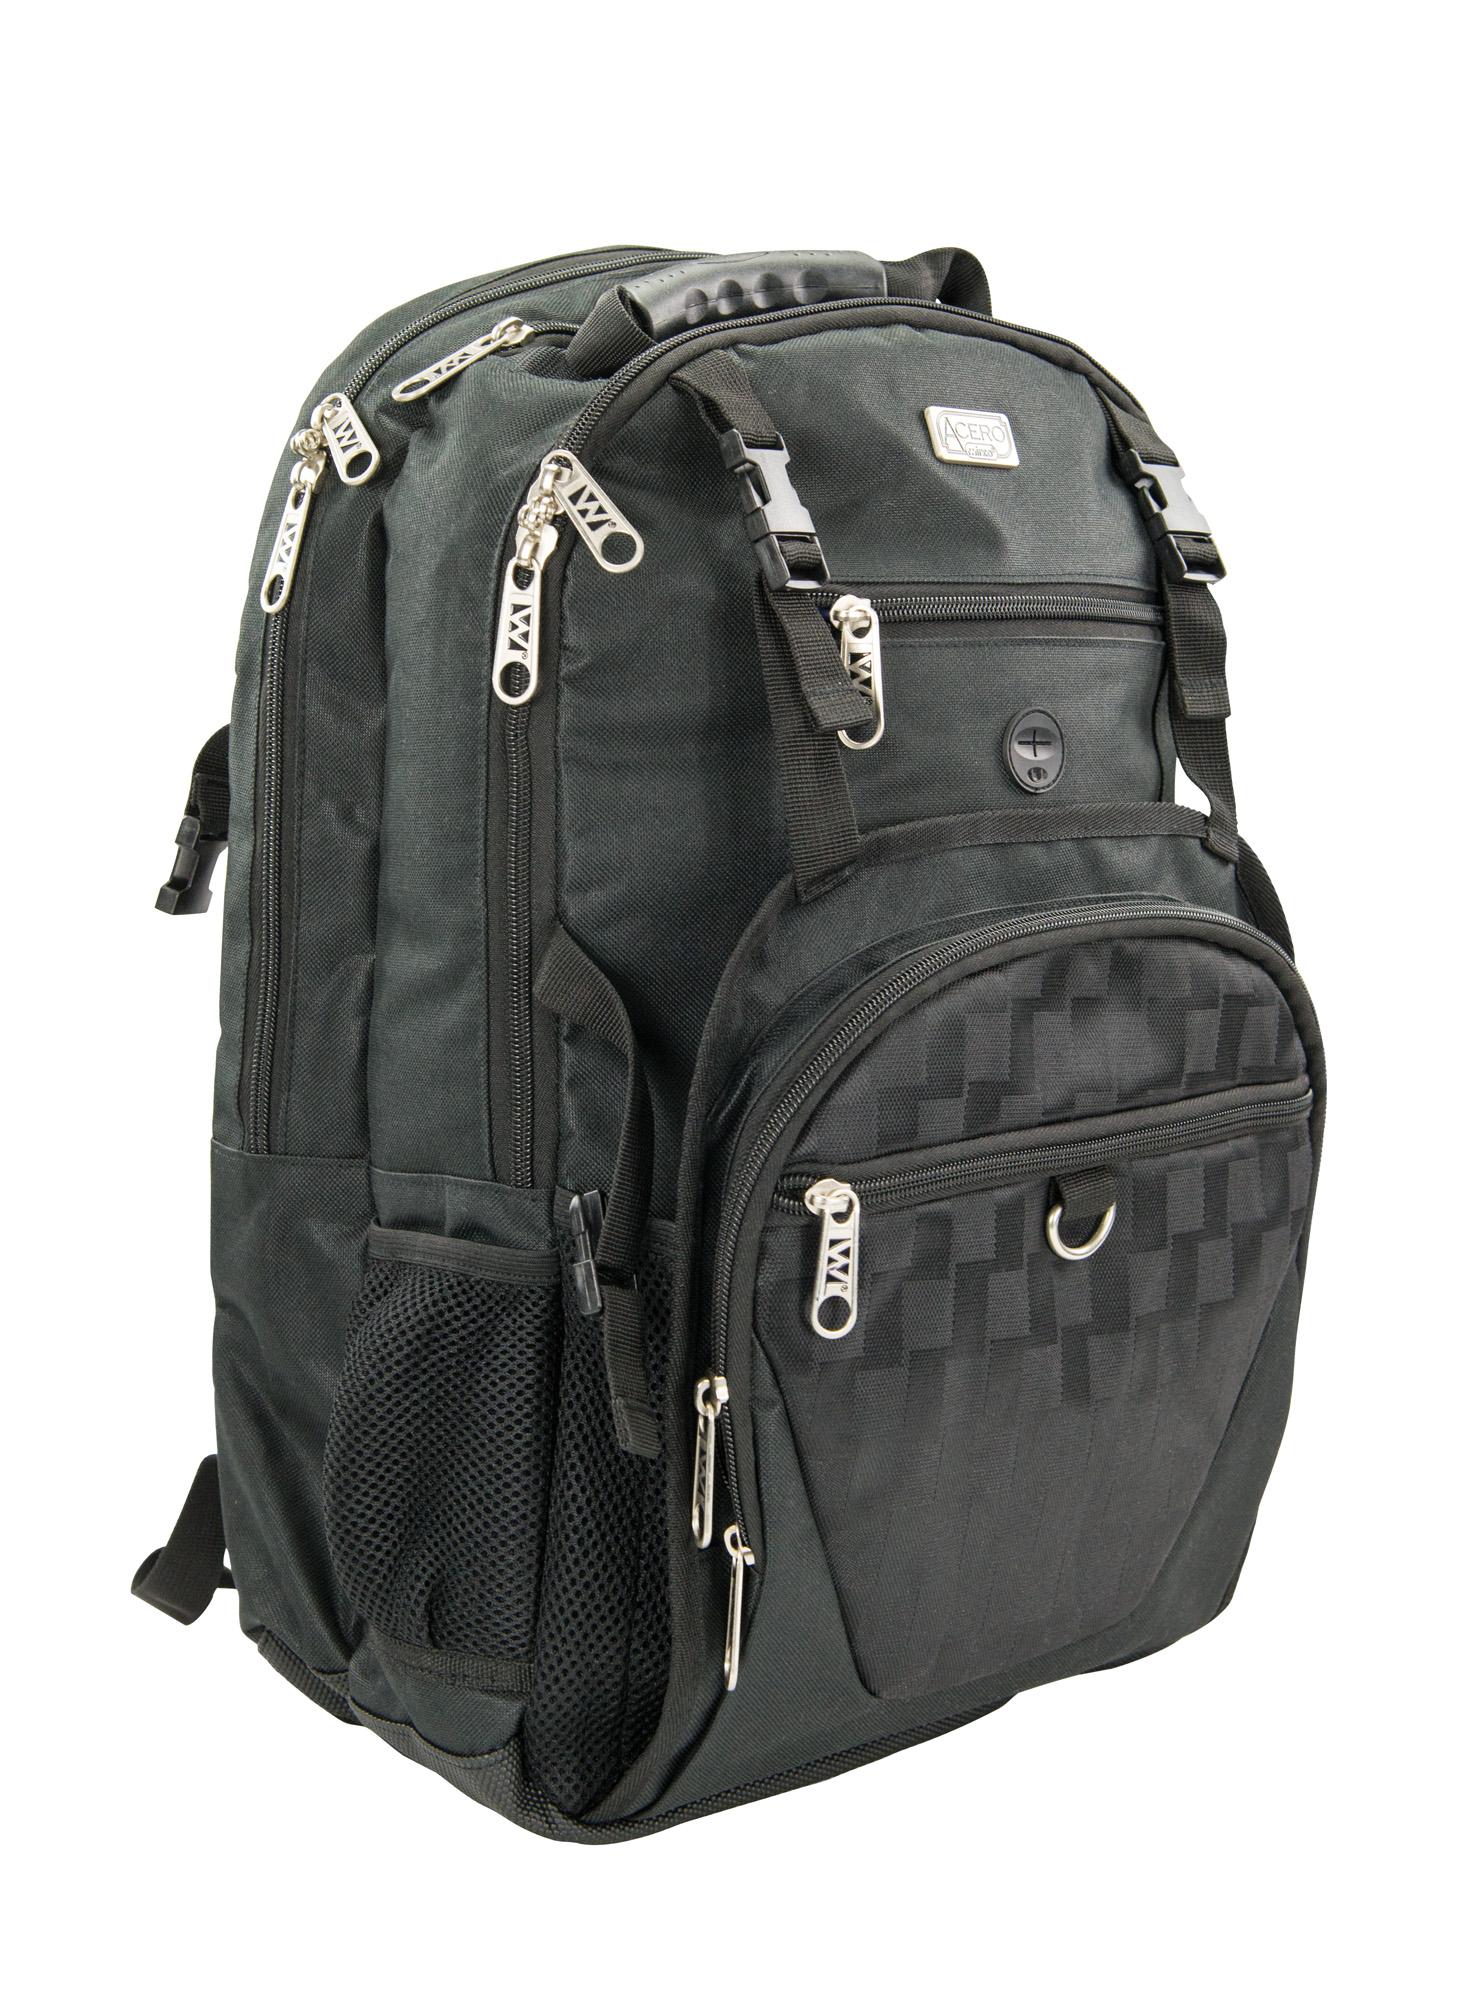 Winco KBP-1 backpack